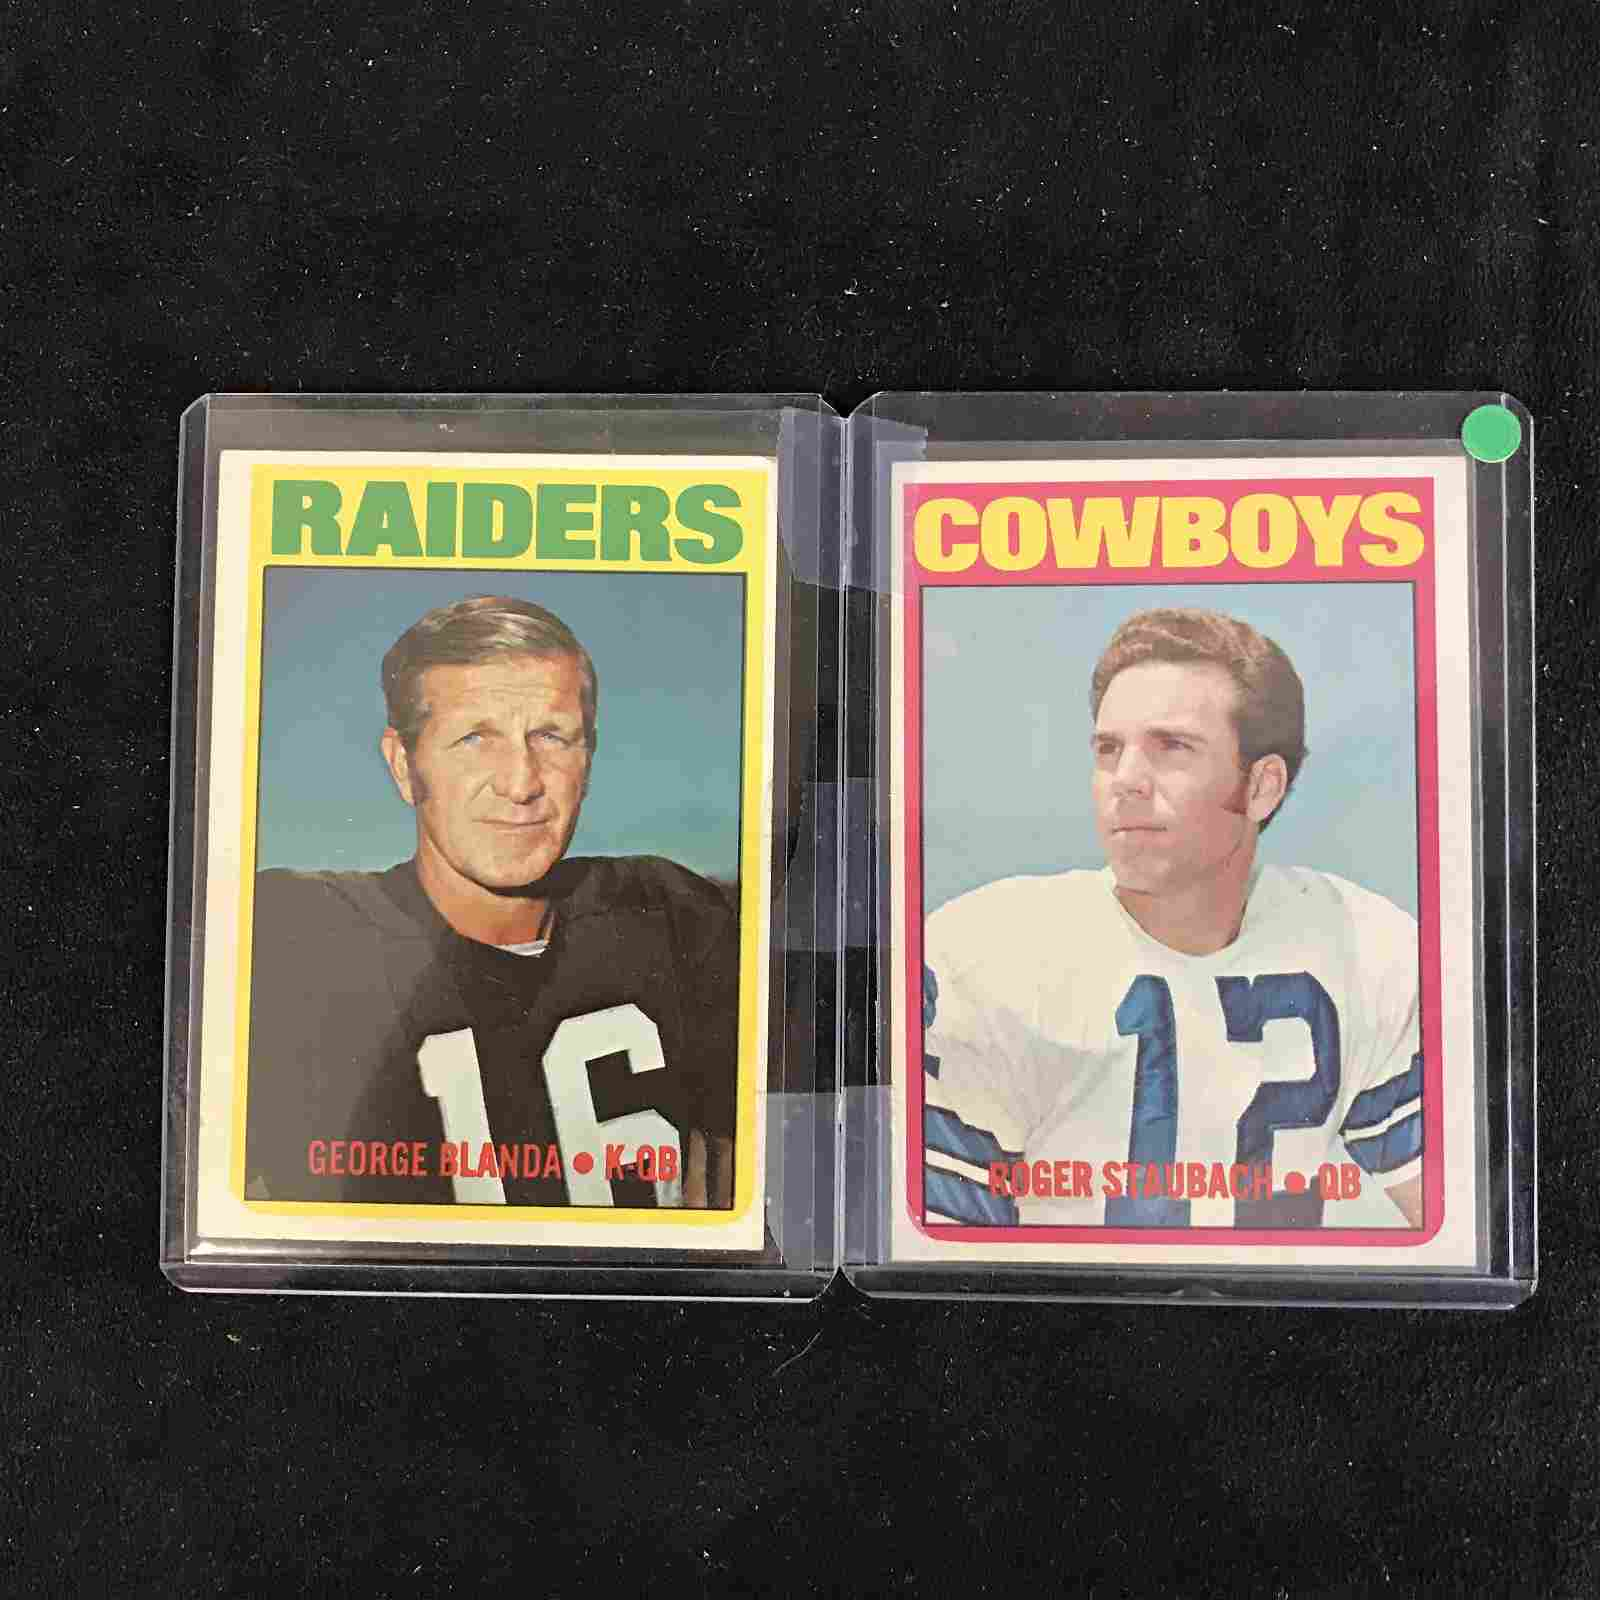 1972 TOPPS FOOTBALL CARD LOT (G. BLANDA/ R. STAUBACH)